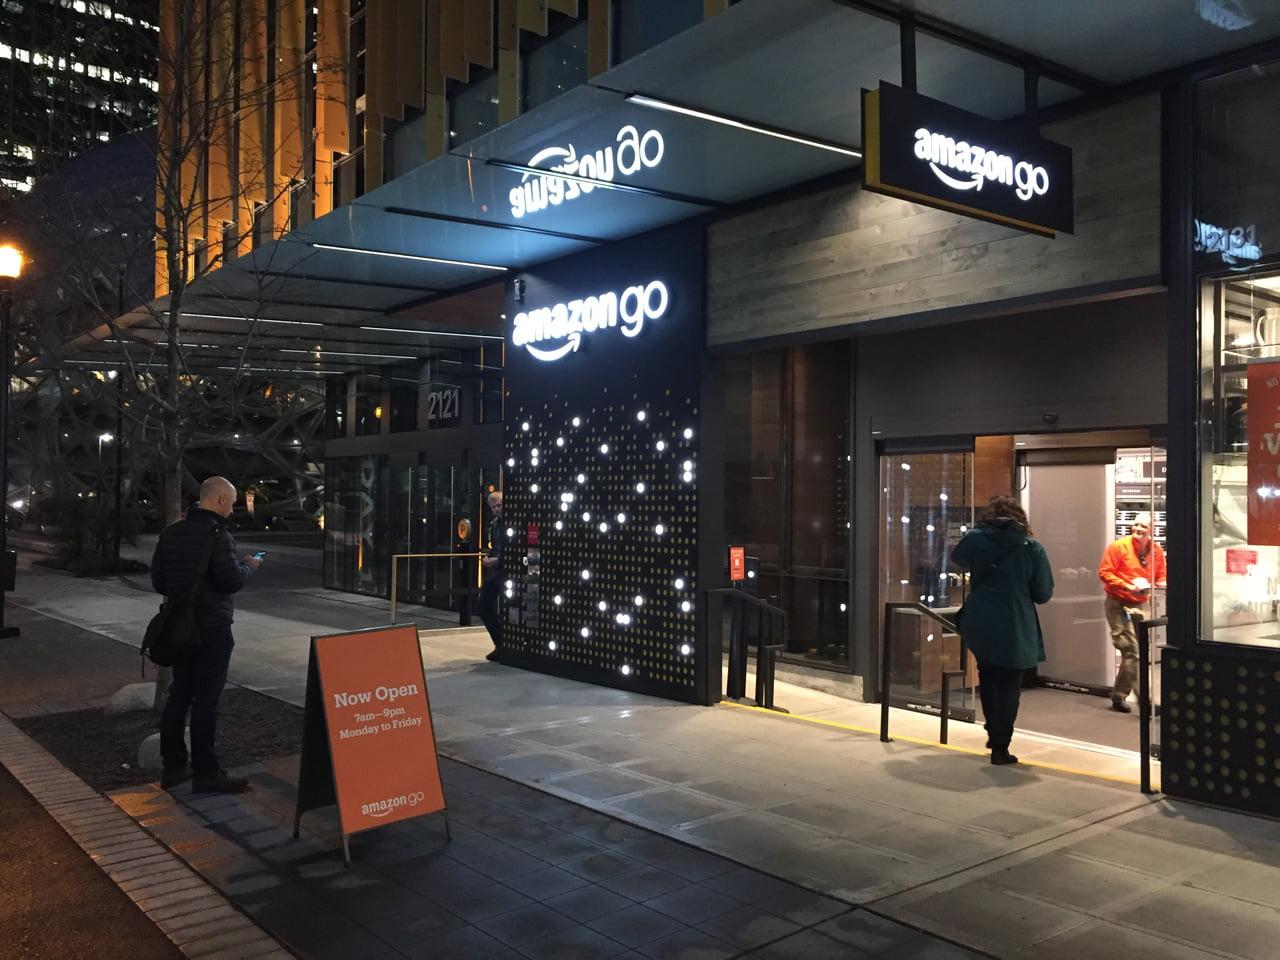 Obchod budoucnosti Amazon Go